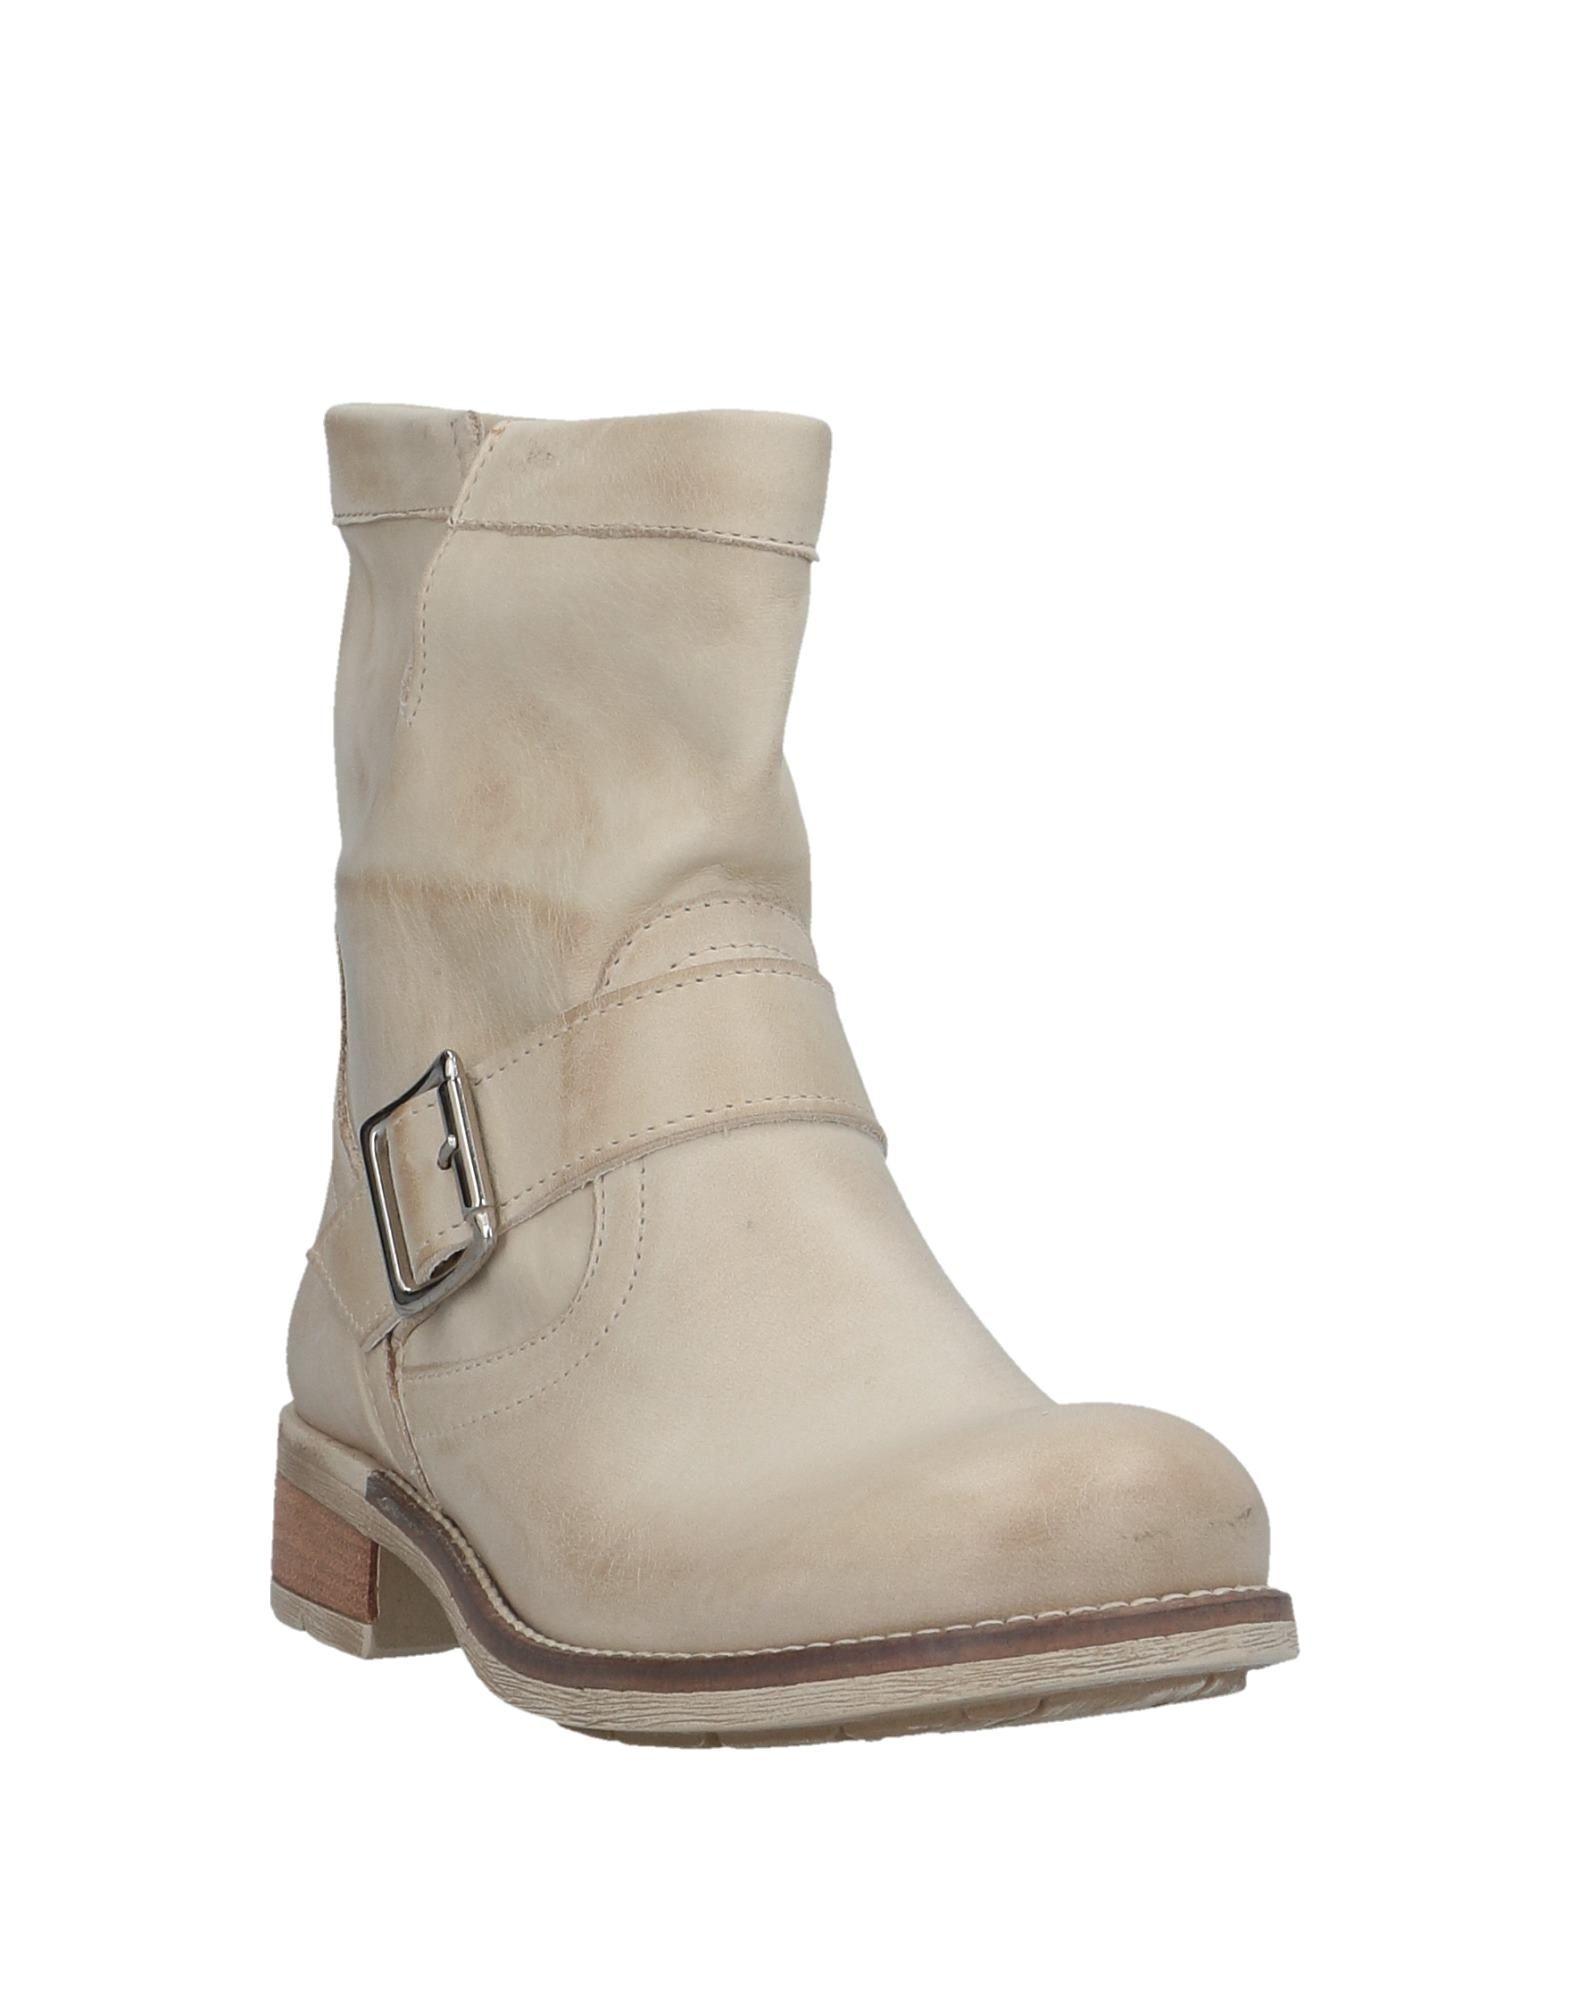 Marina Grau Grau Marina Stiefelette Damen 11540370GX Gute Qualität beliebte Schuhe 866507